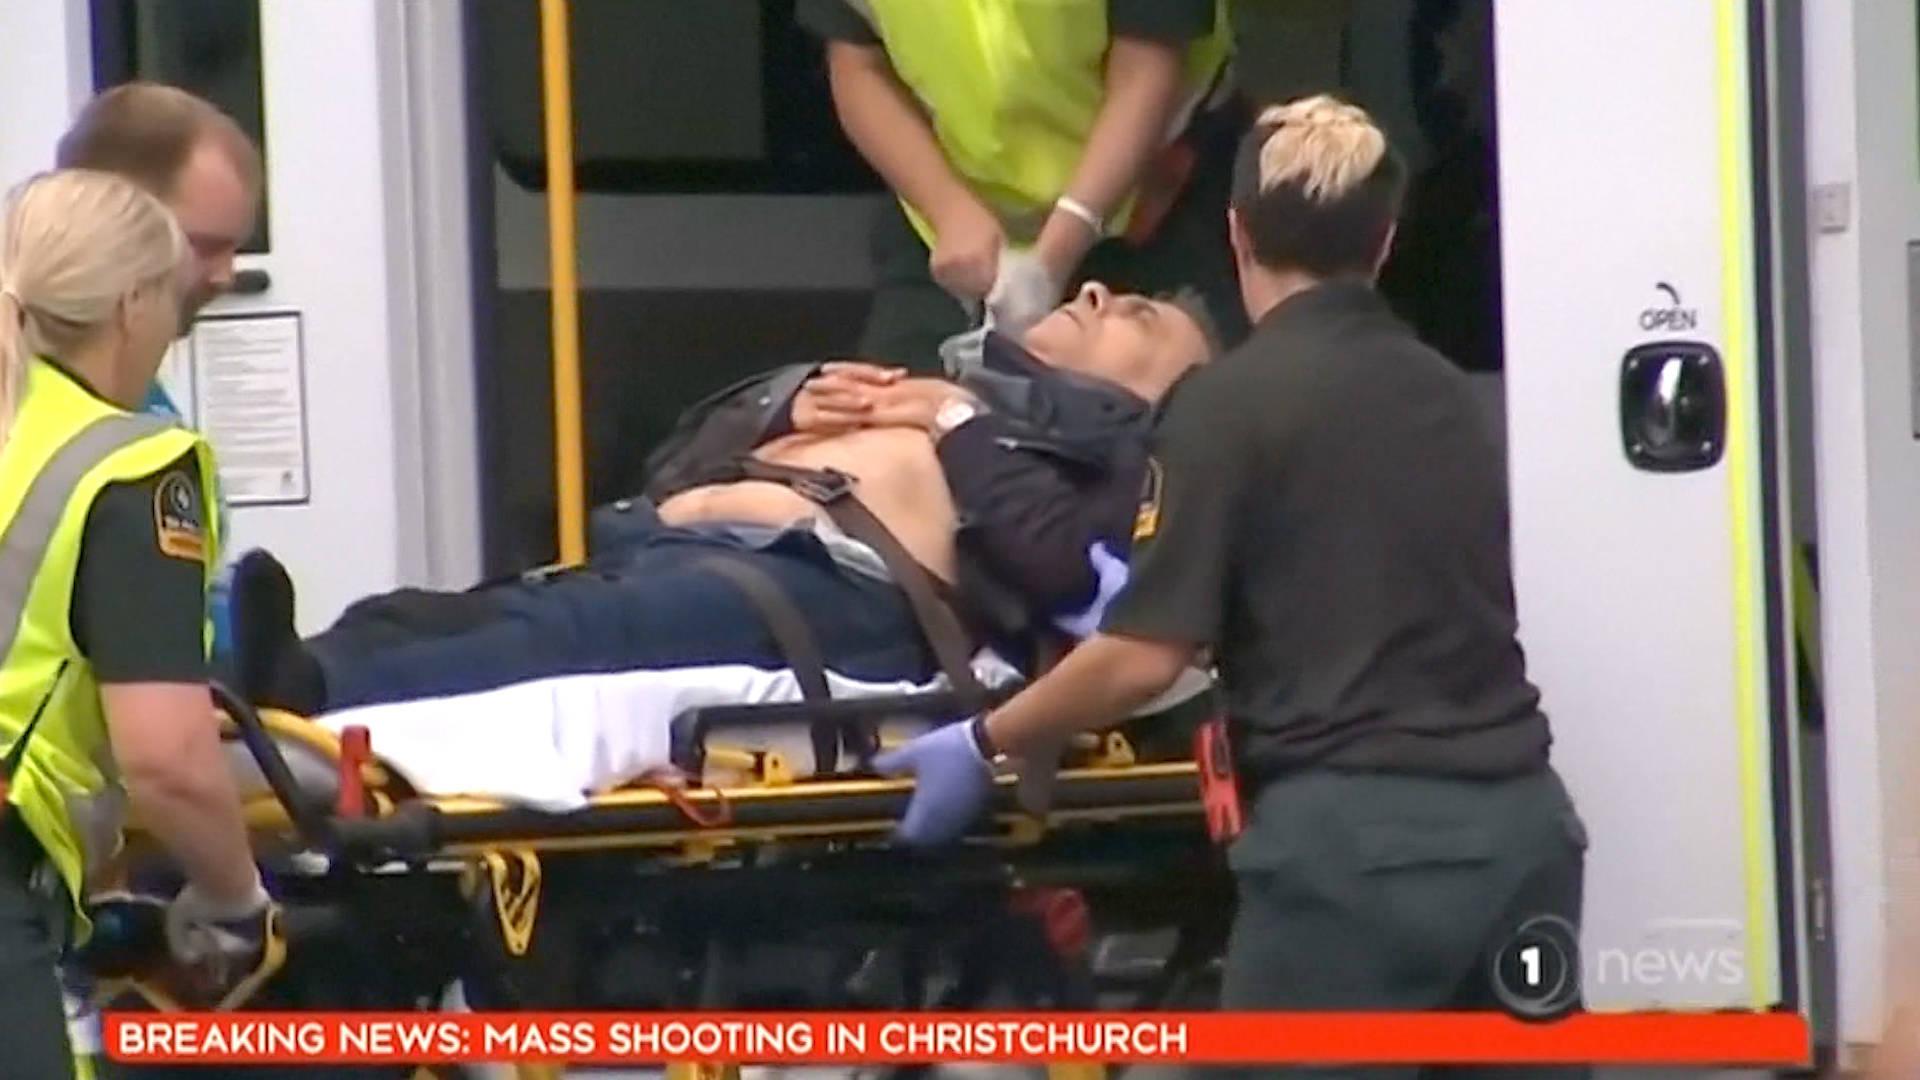 Nz Shooting Hd: 49 Dead As Far-Right Shooter Opens Fire On New Zealand